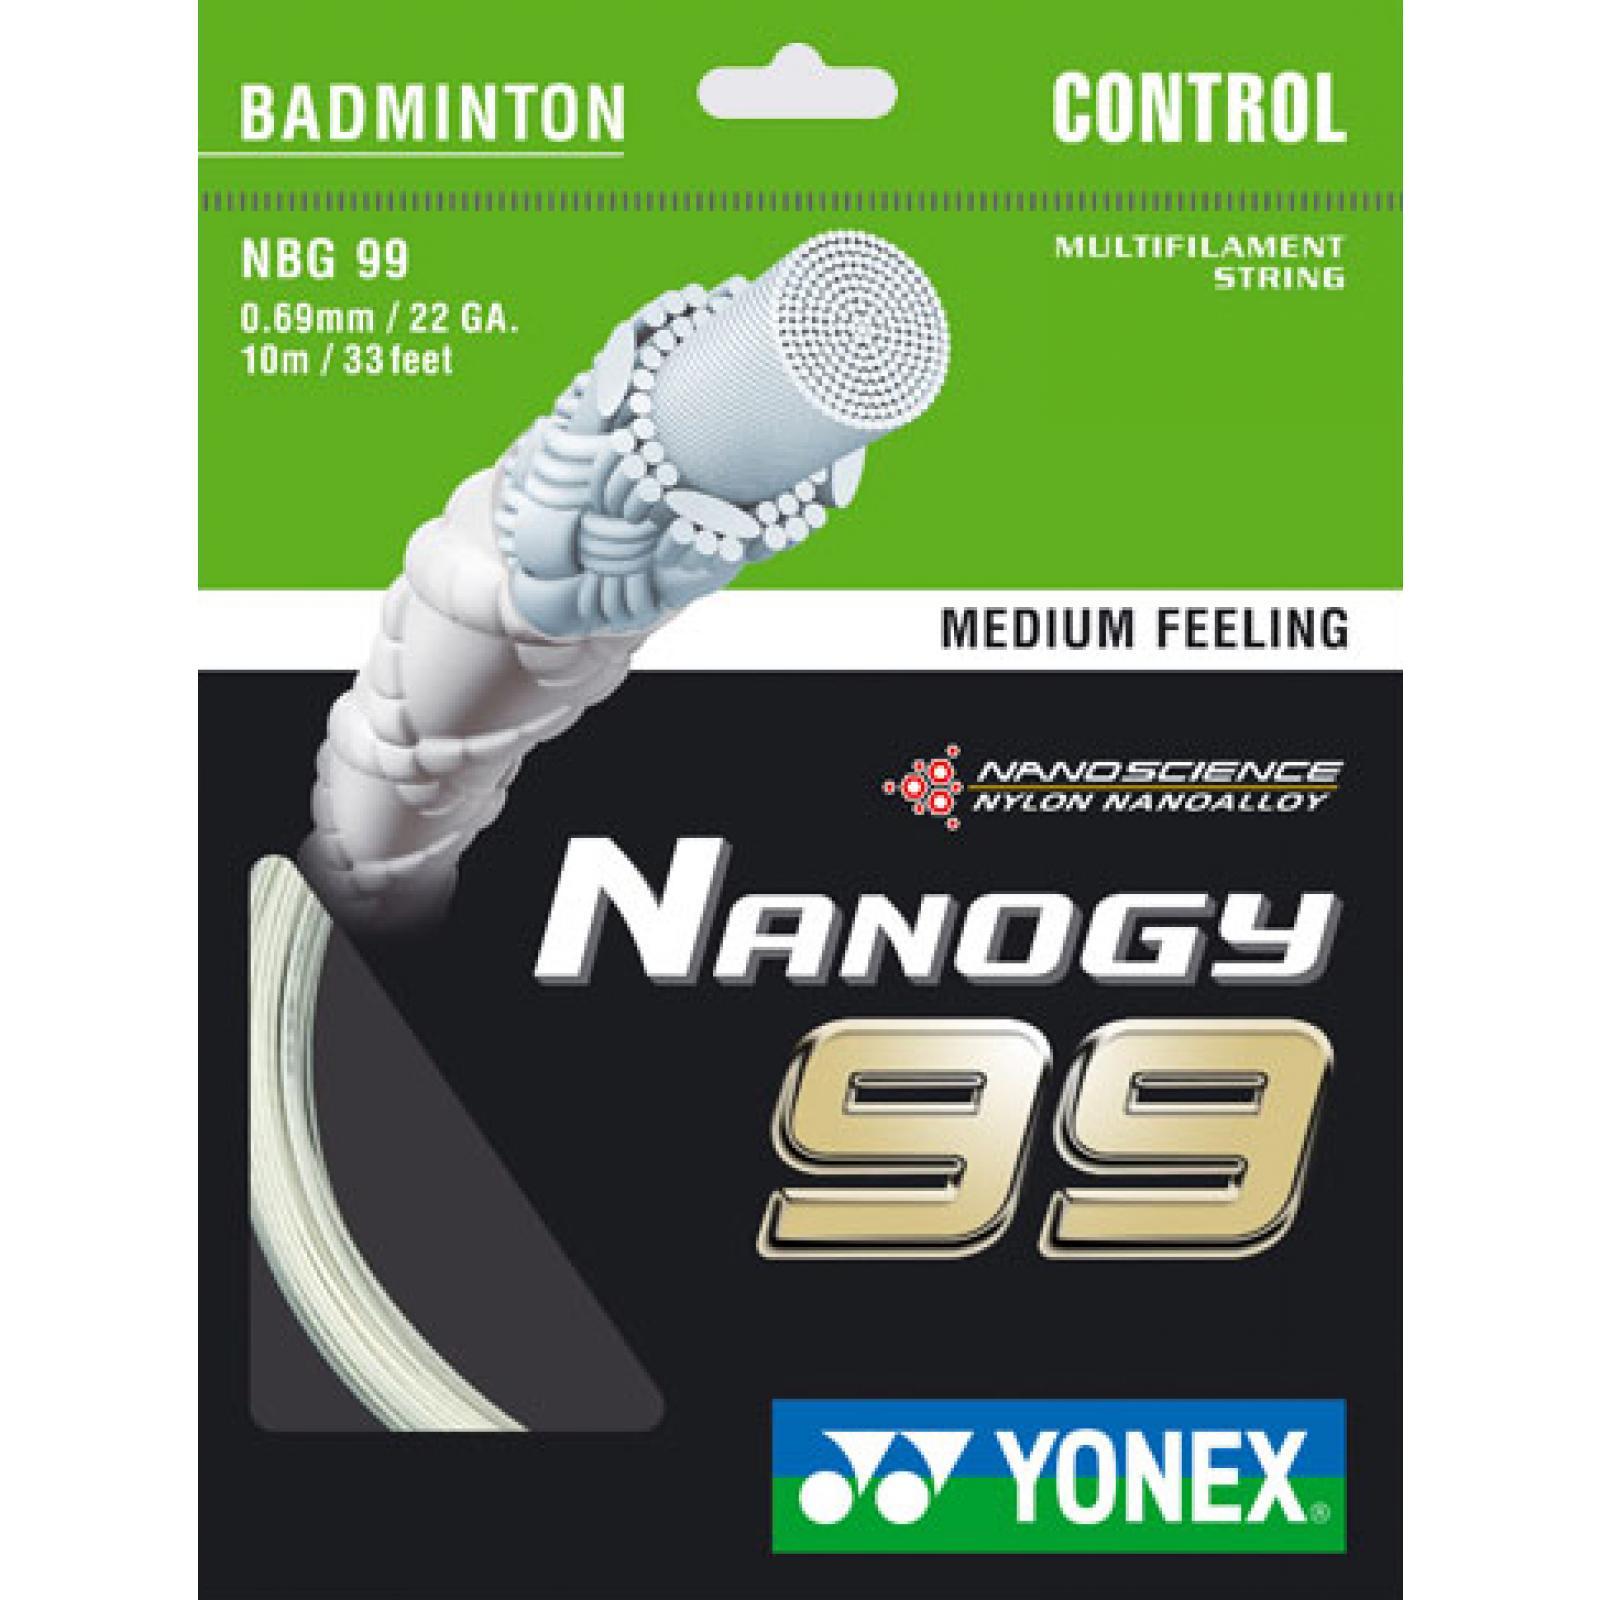 https://www.badec.store/produkty_img/badmintonovy-vyplet1571925901L.jpg